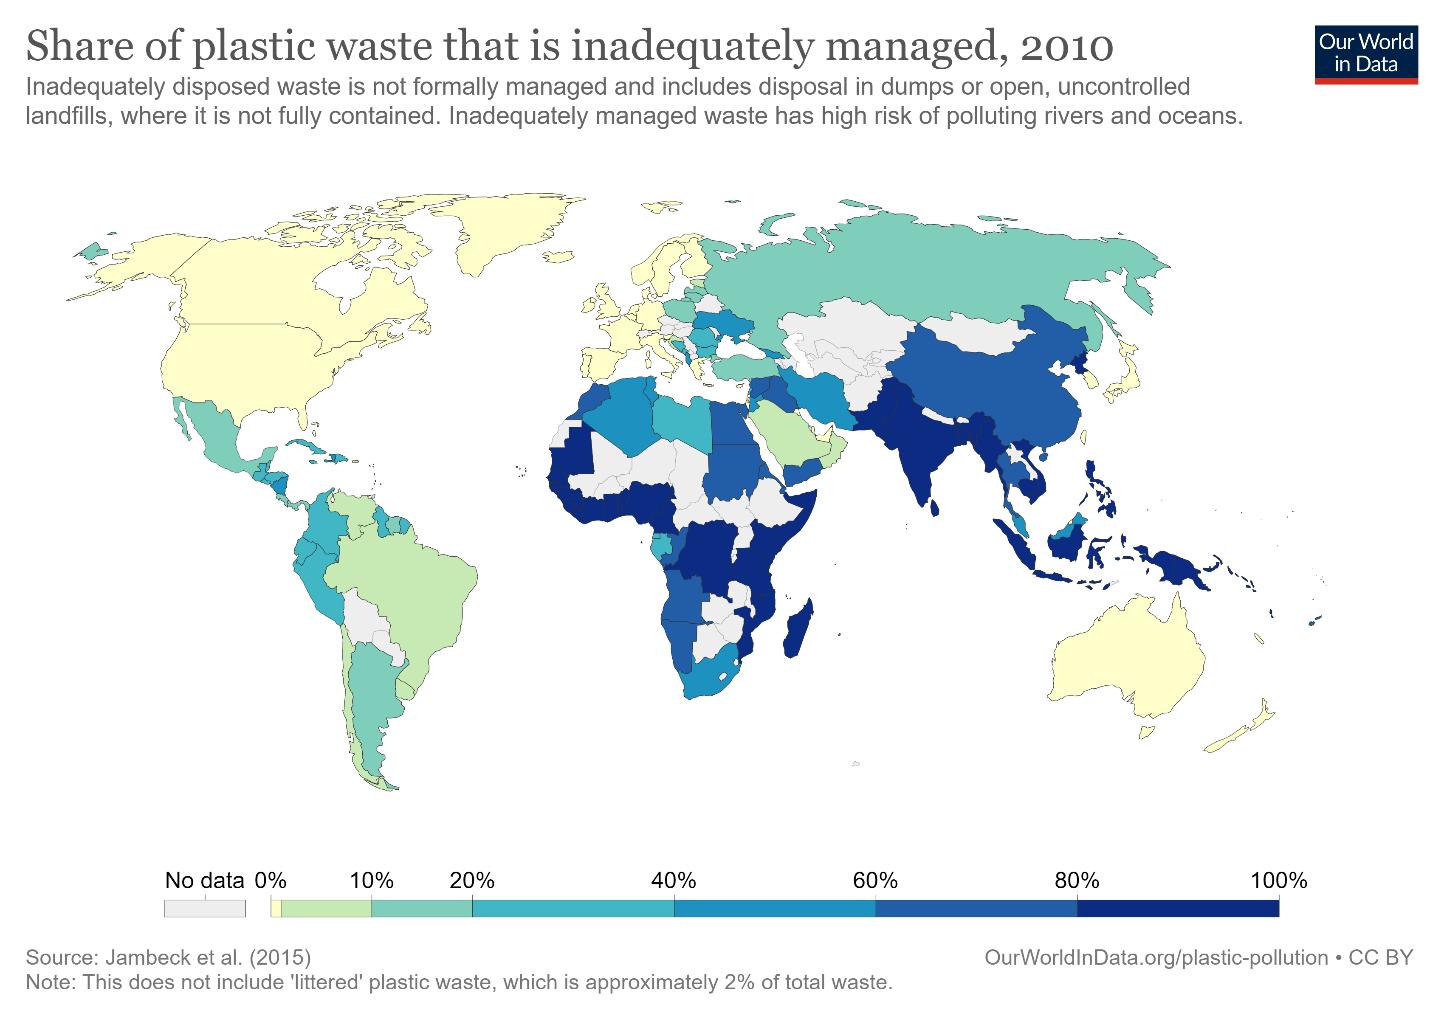 Mismanaged Plastic Map